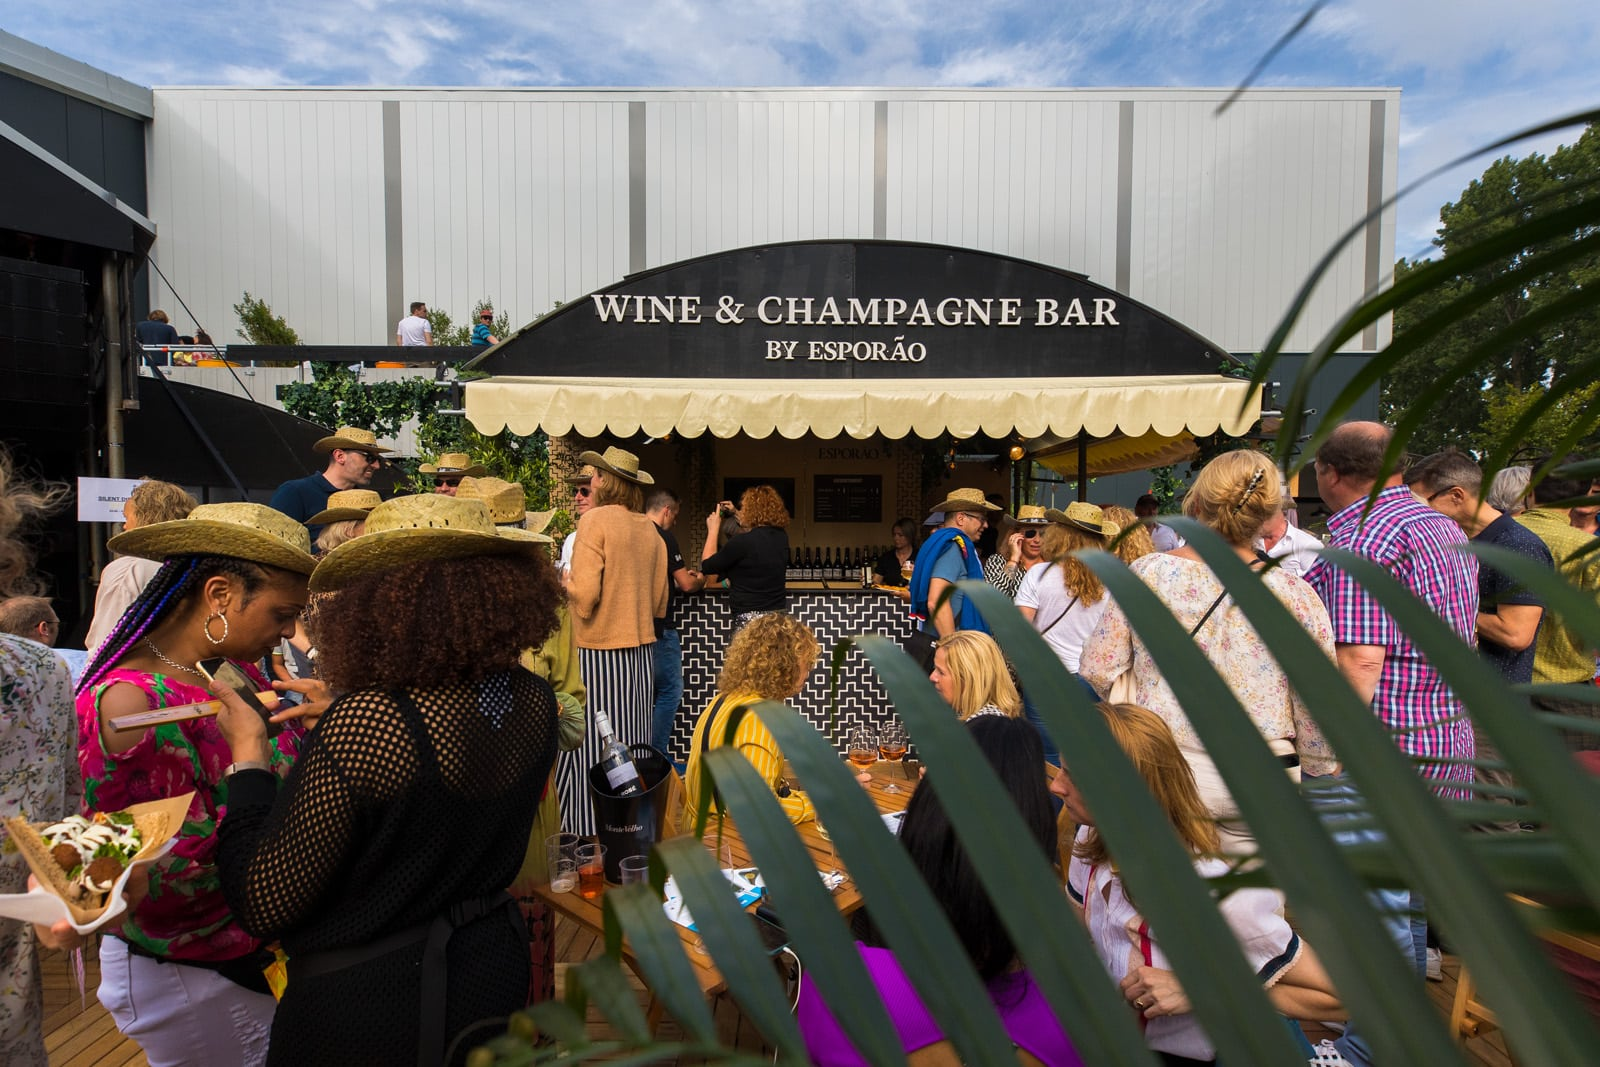 Wine & Champagne bar